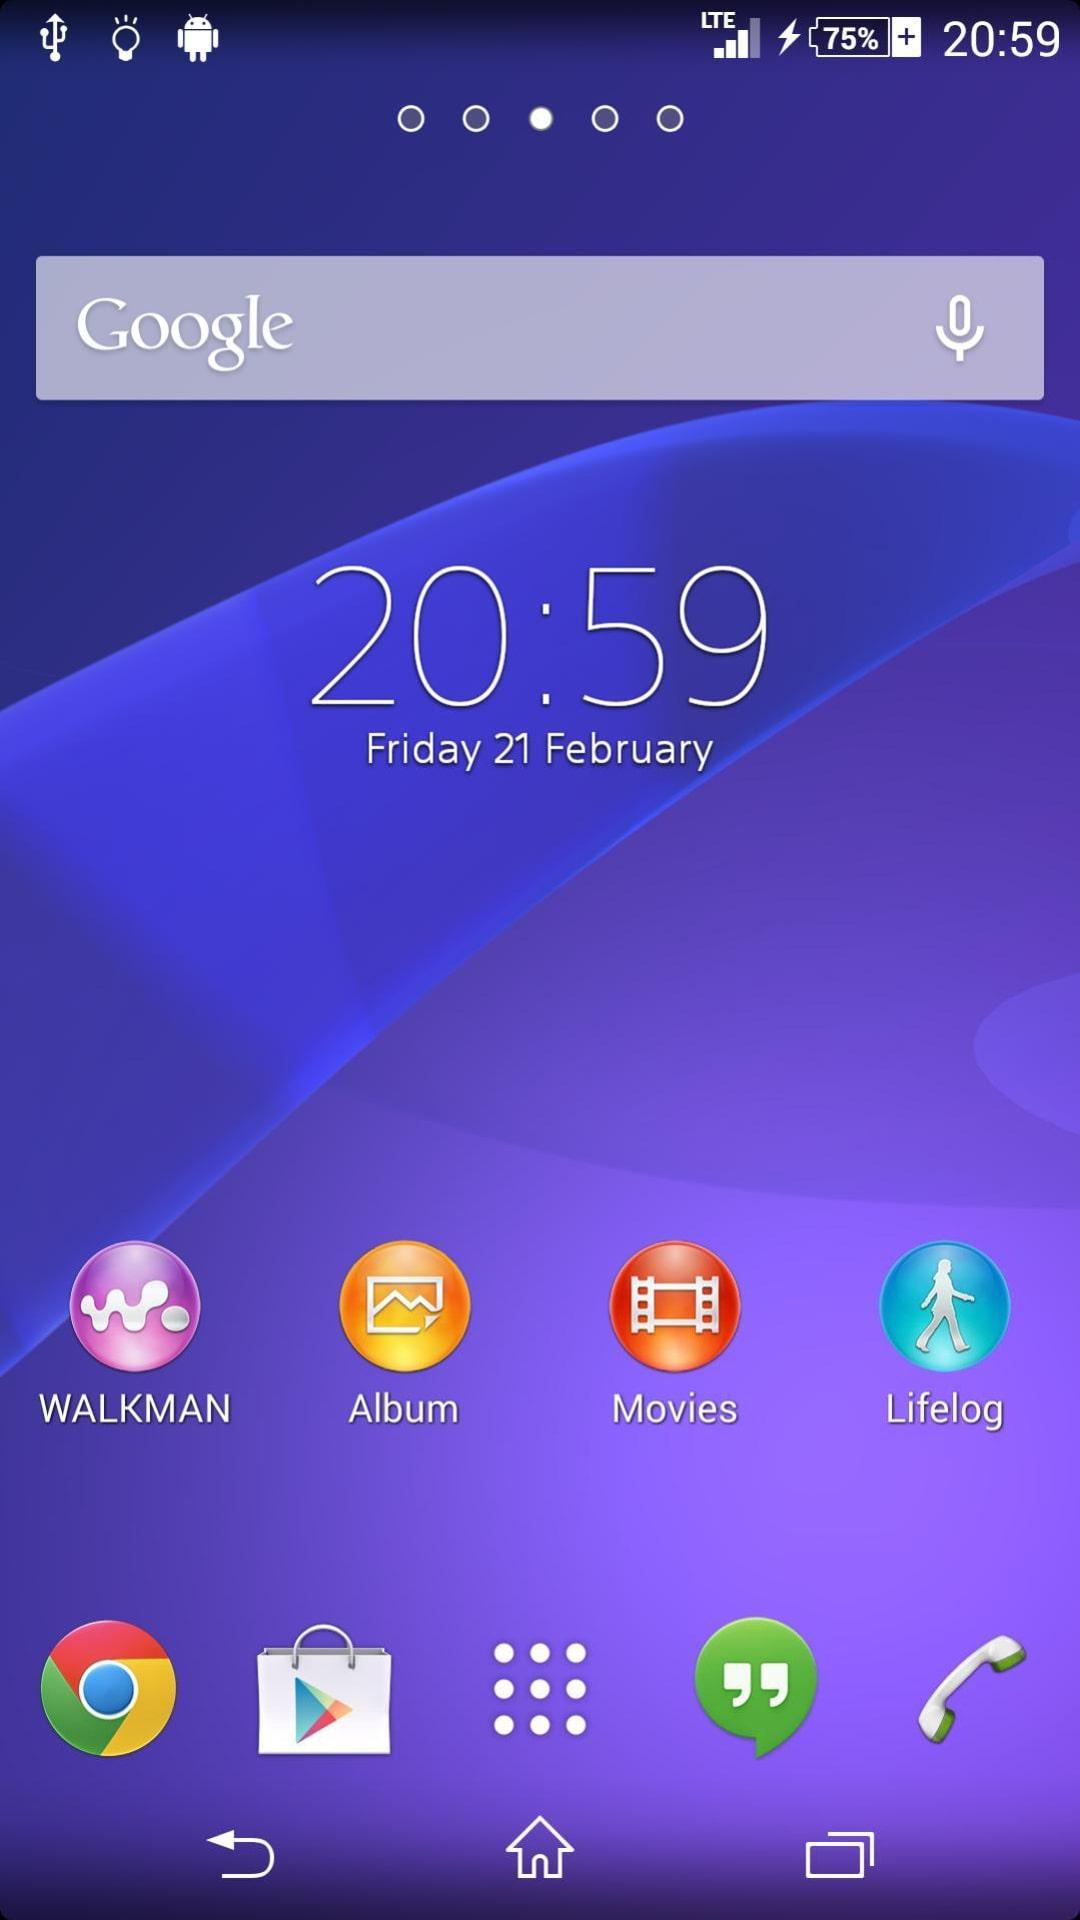 Sony Xperia Sirius UI